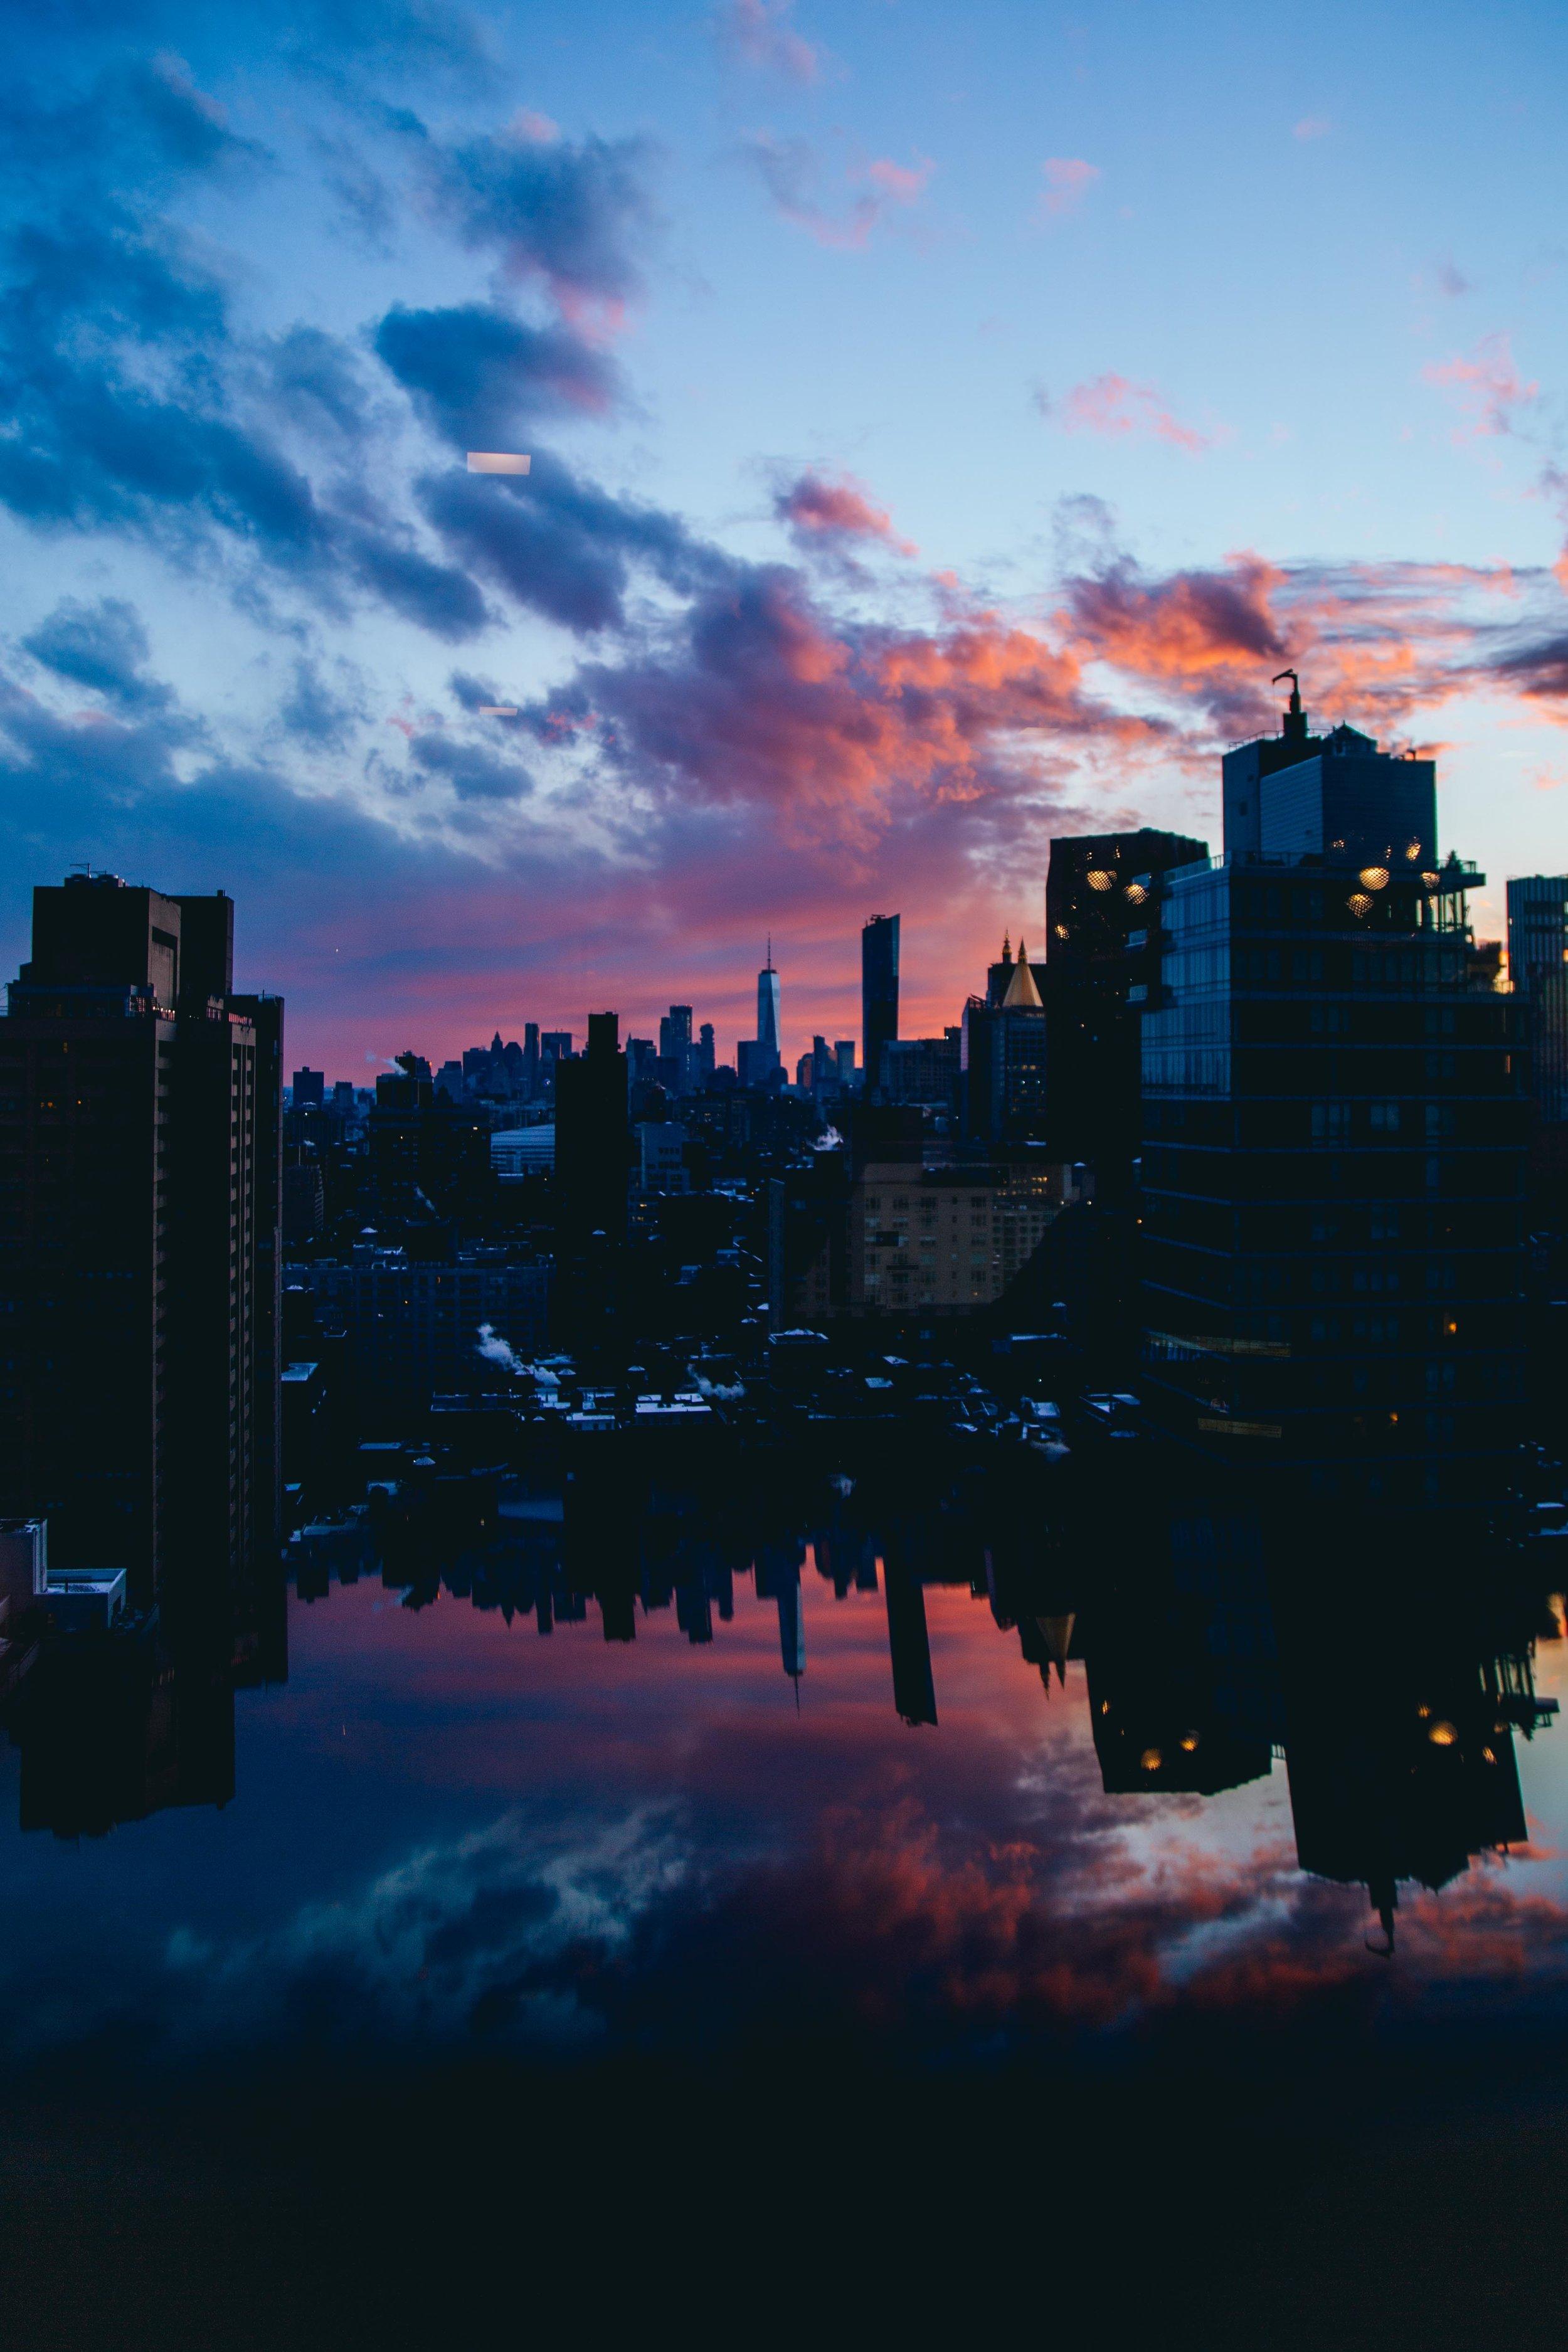 Sunset-0115.jpg